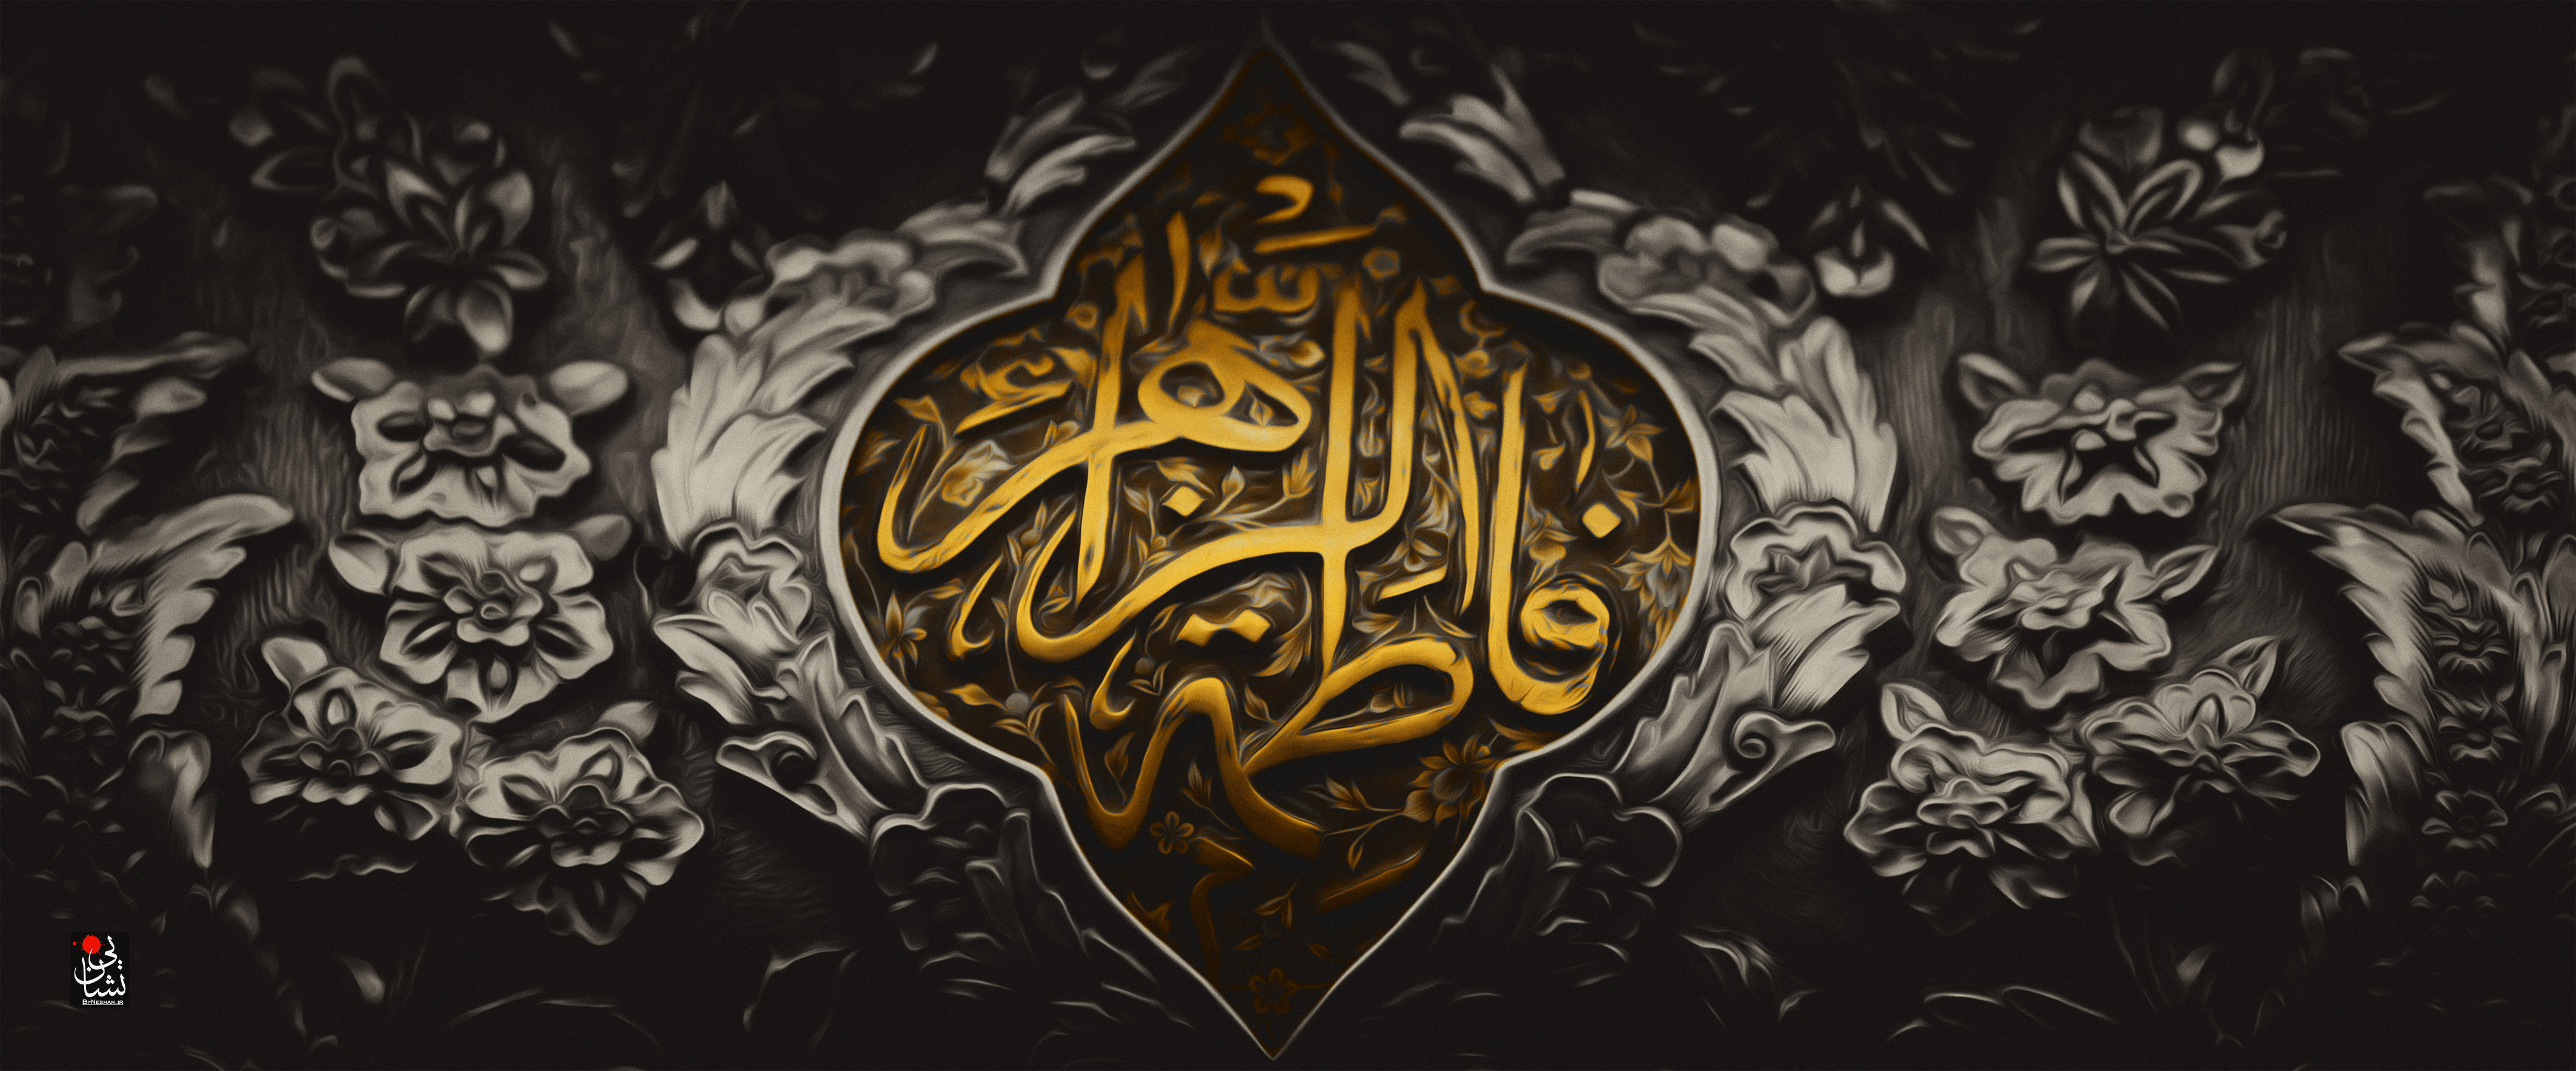 http://bi-neshan.ir/wp-content/uploads/2014/03/H.Zahras-11.jpg